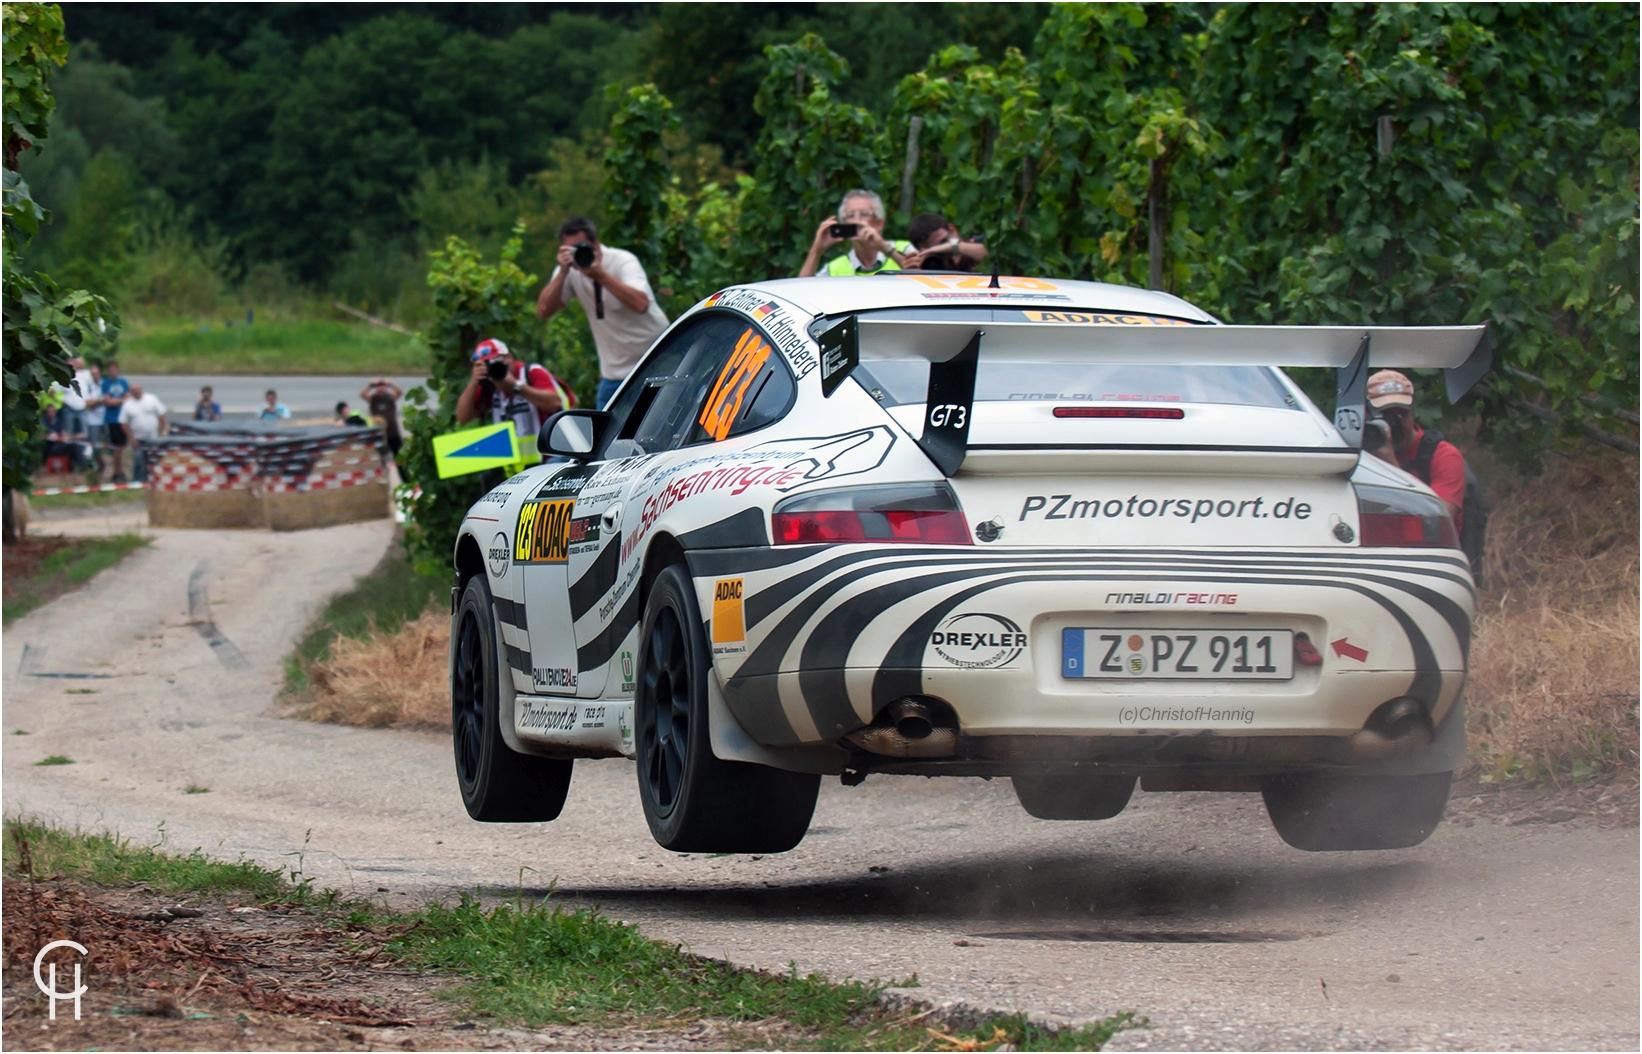 Ruben Zeltner - Porsche 996 GT3 - 30. ADAC WRC Rallye Deutschland 2012